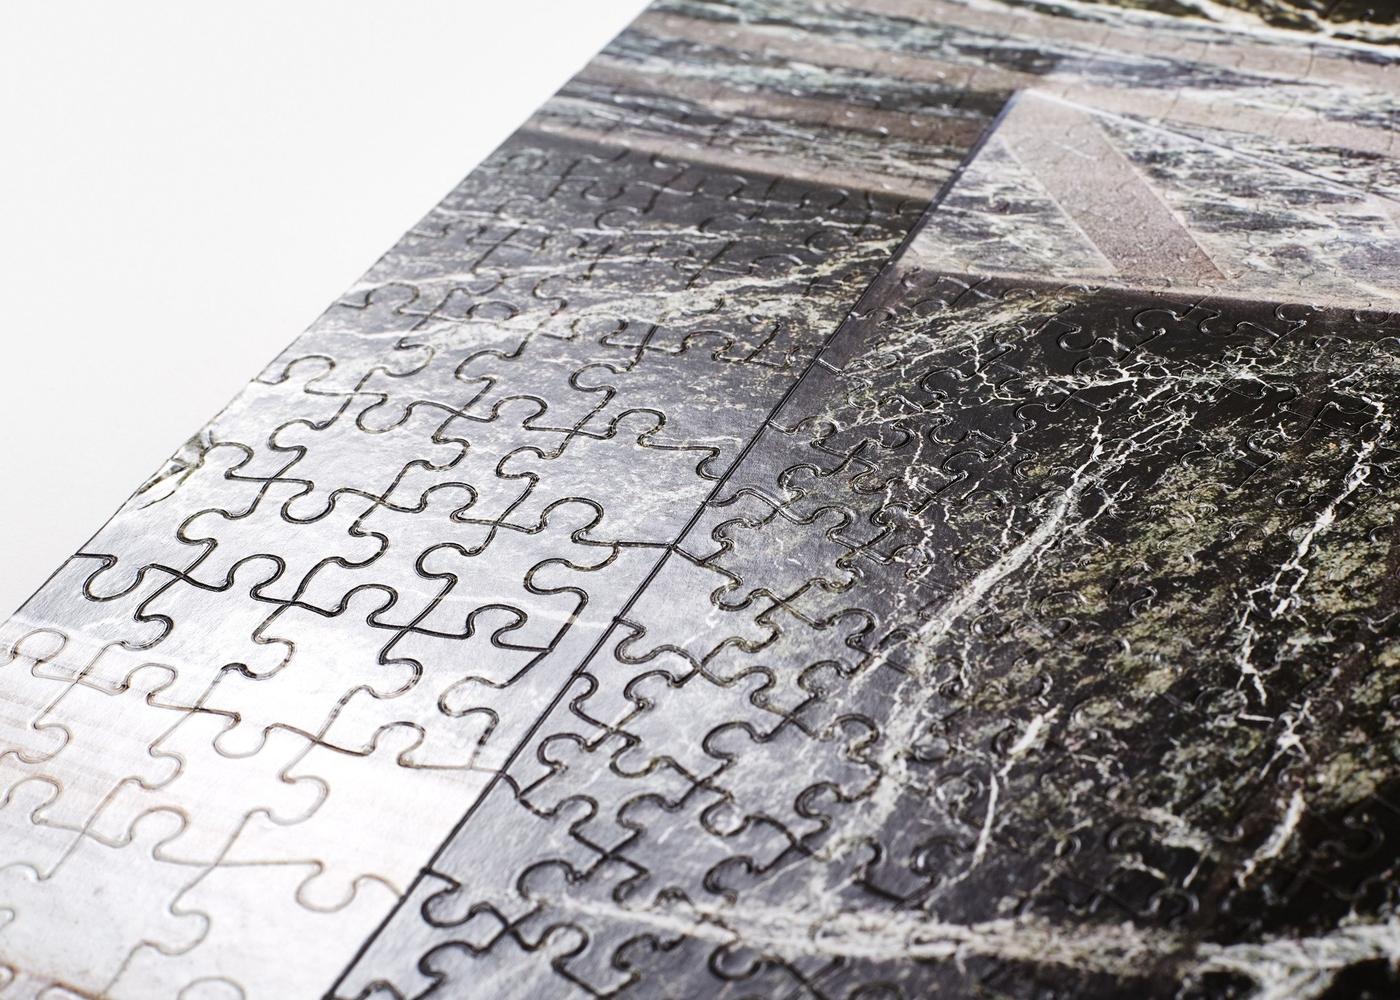 PuzzleInPuzzle-marble-silo-detail-17S-KKPPMA_2aef254f-f31a-4477-a9af-e4f4f58b8cd3_2048x2048.jpg